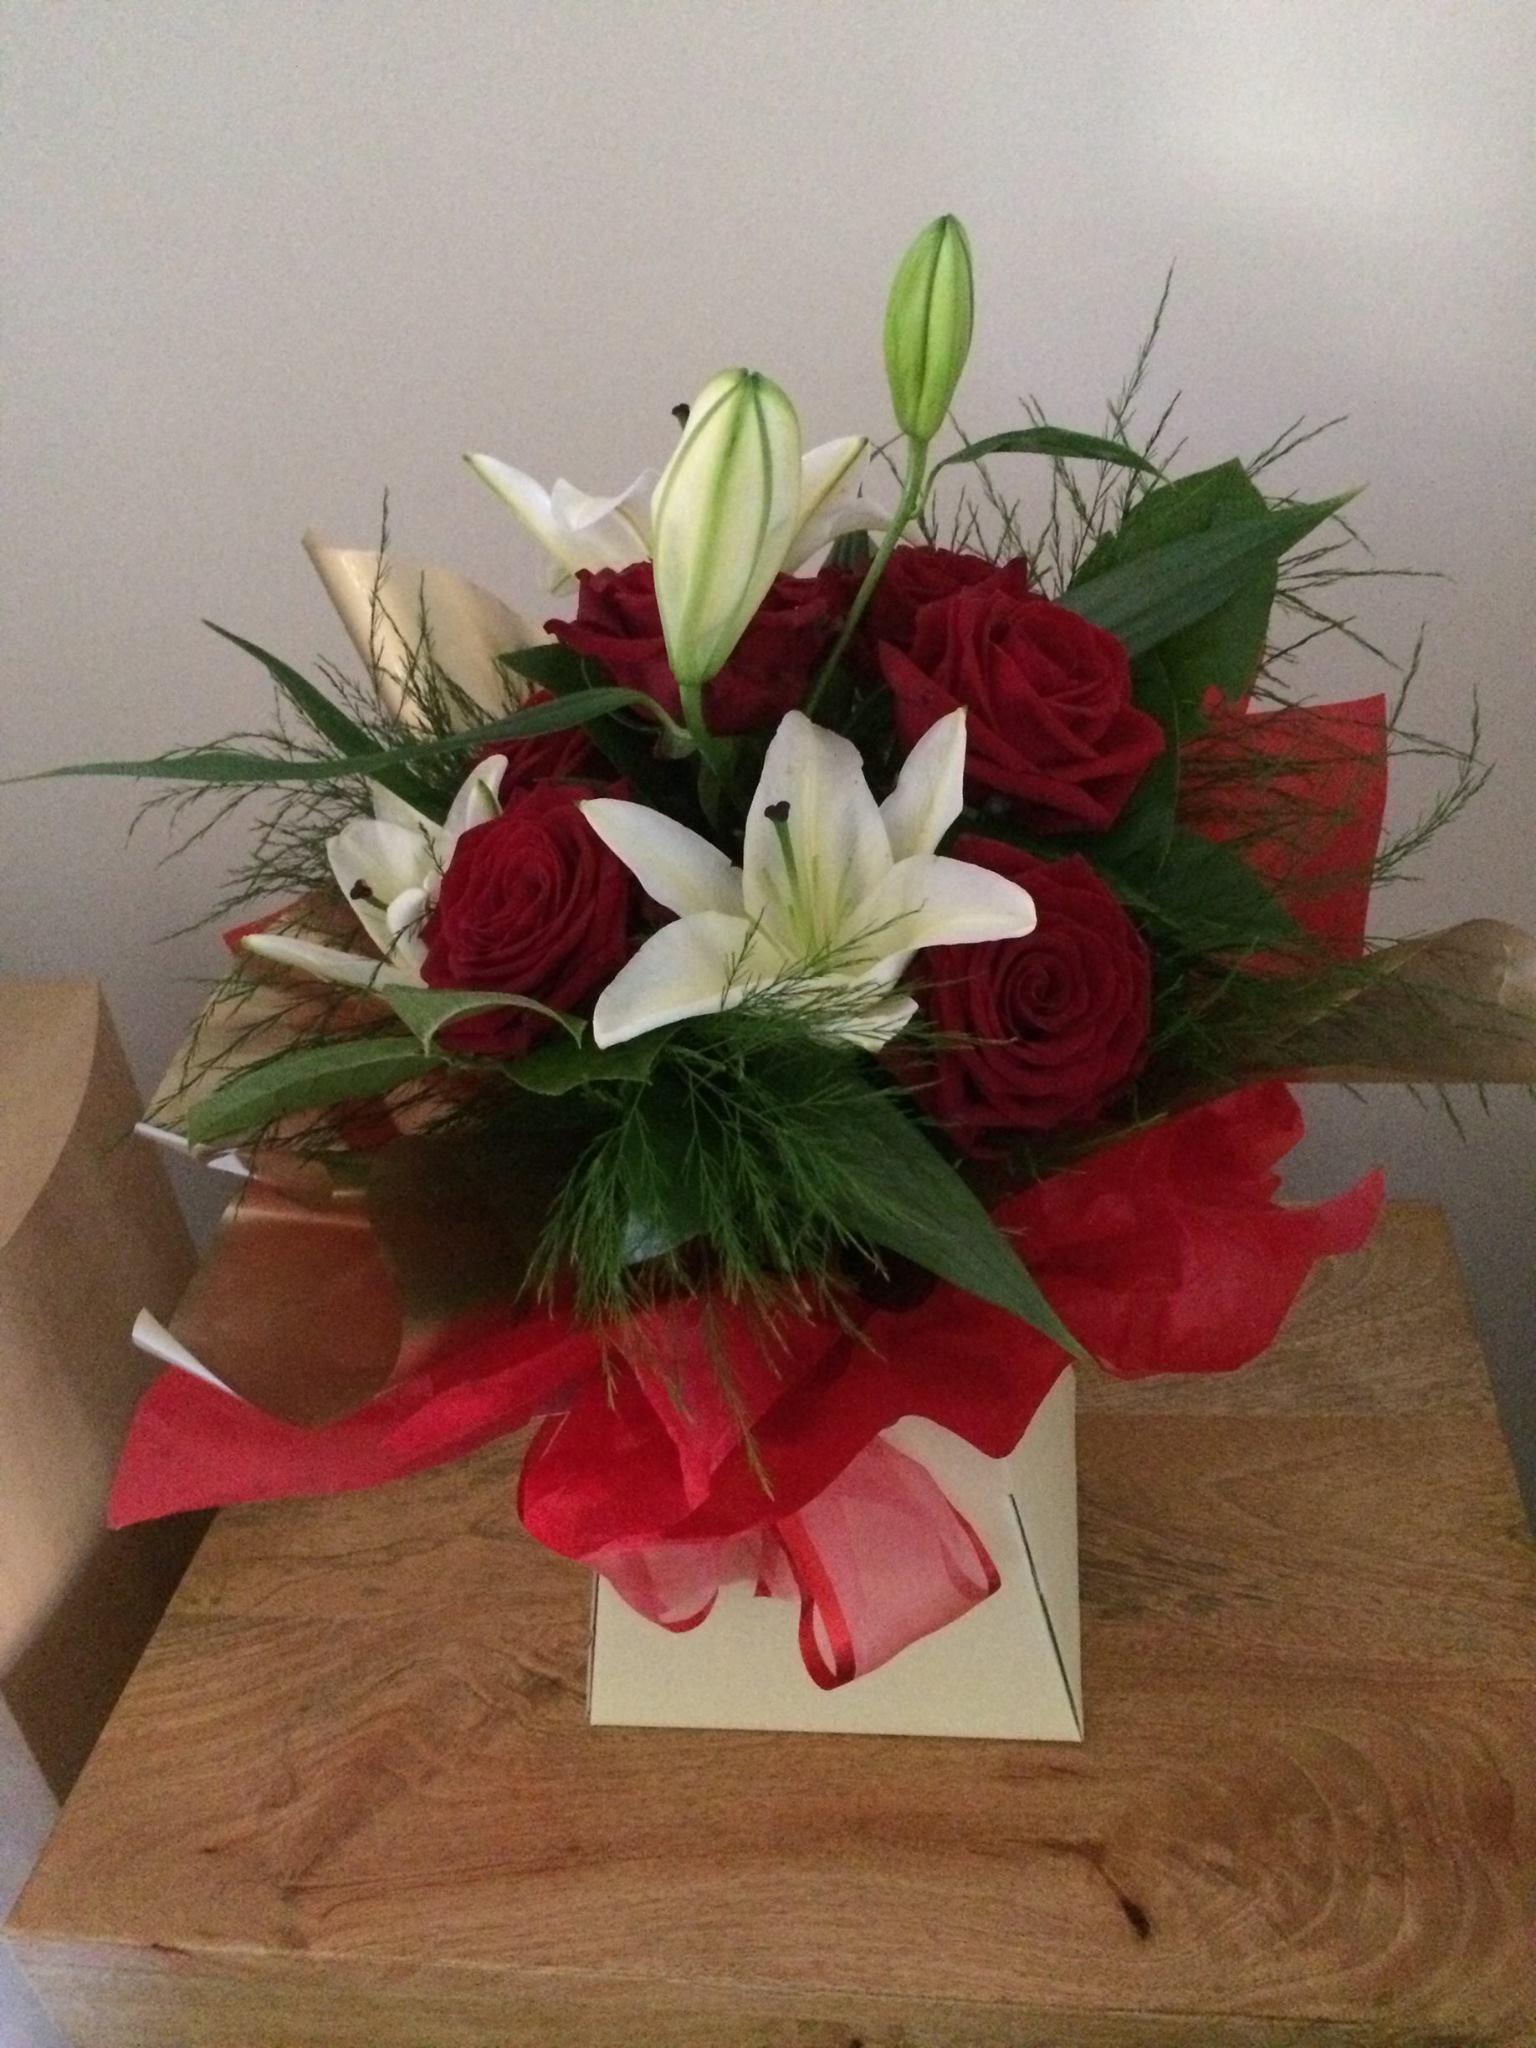 The Brookhouse Florist